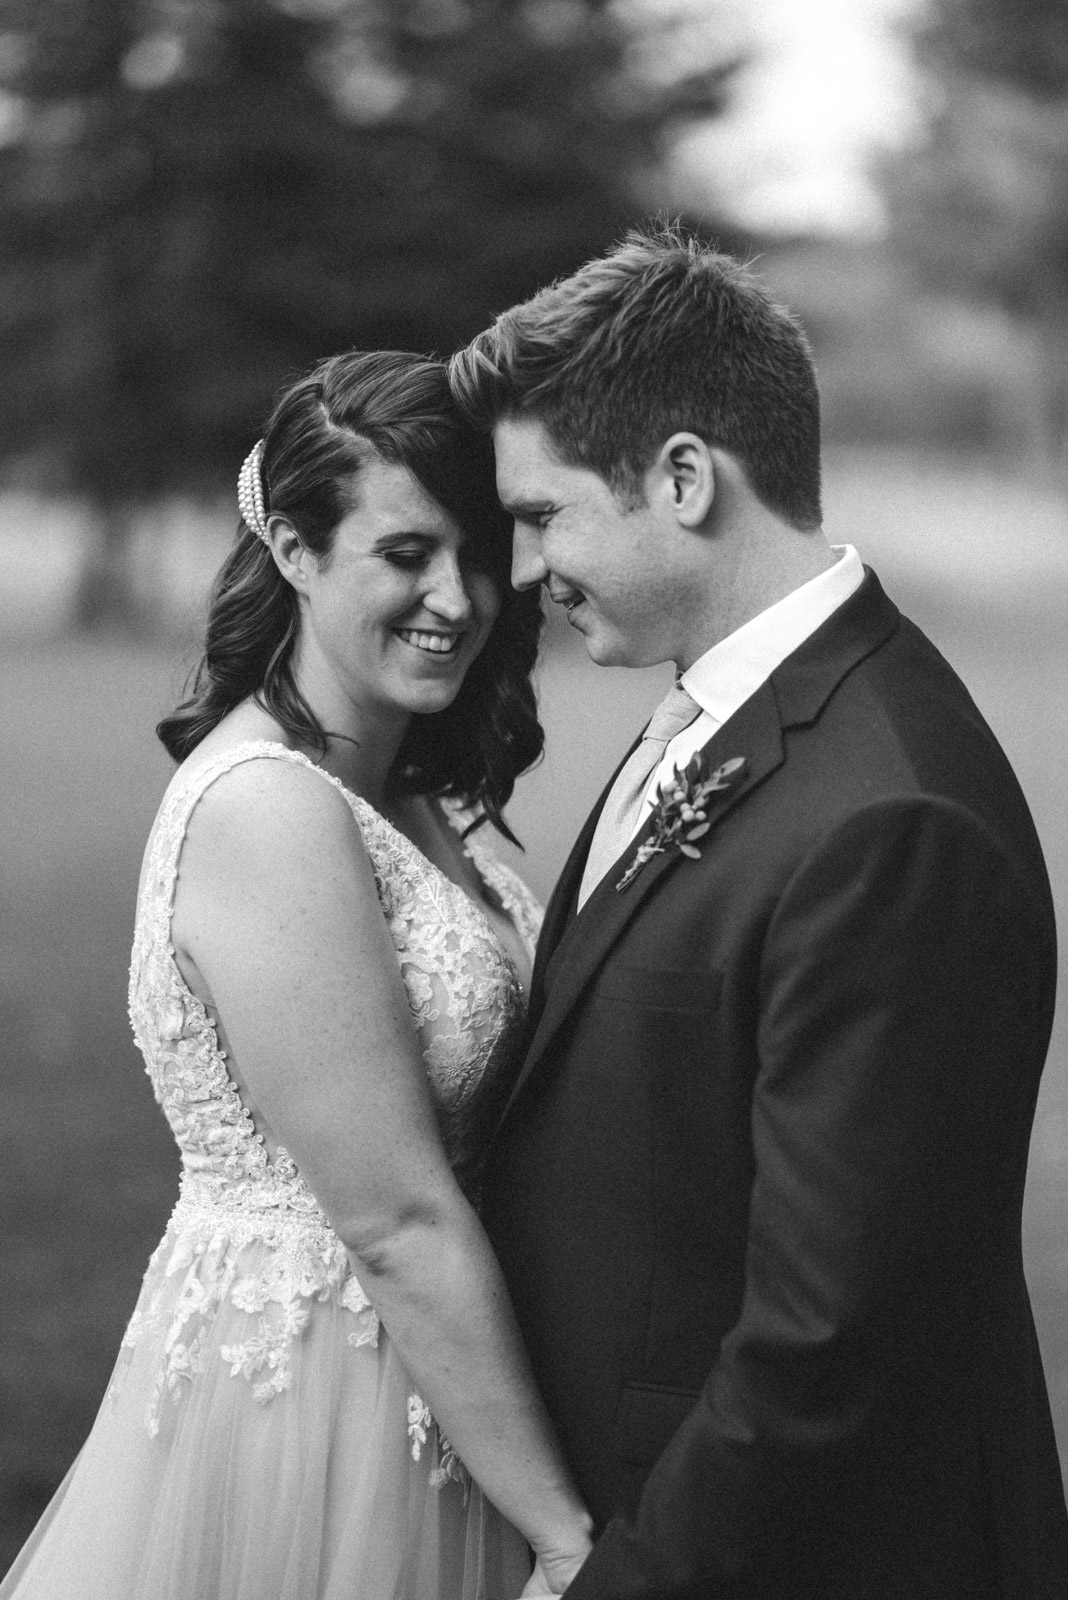 Emerson & Elicia's Golf Course Wedding Aidan & Leanne Hennebry Hamilton Wedding Videographers Photographers Niagara Hush Hush Photography & Film-55.jpg